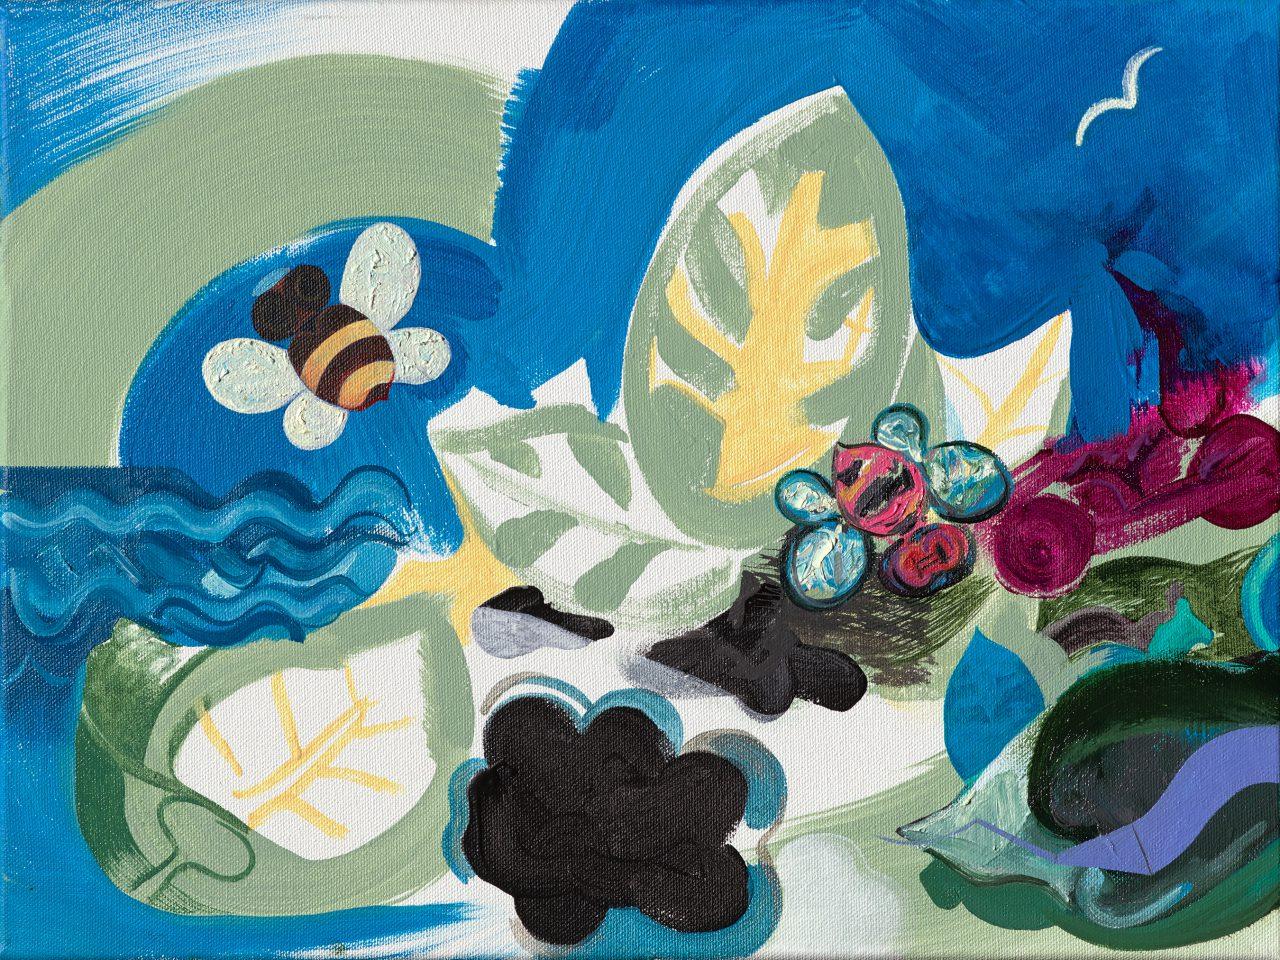 Garden of Hymenoptera | Original title: Tuin der vliesvleugeligen 2019 | 29 x 40 cm. Acrylic and oil paint on canvas